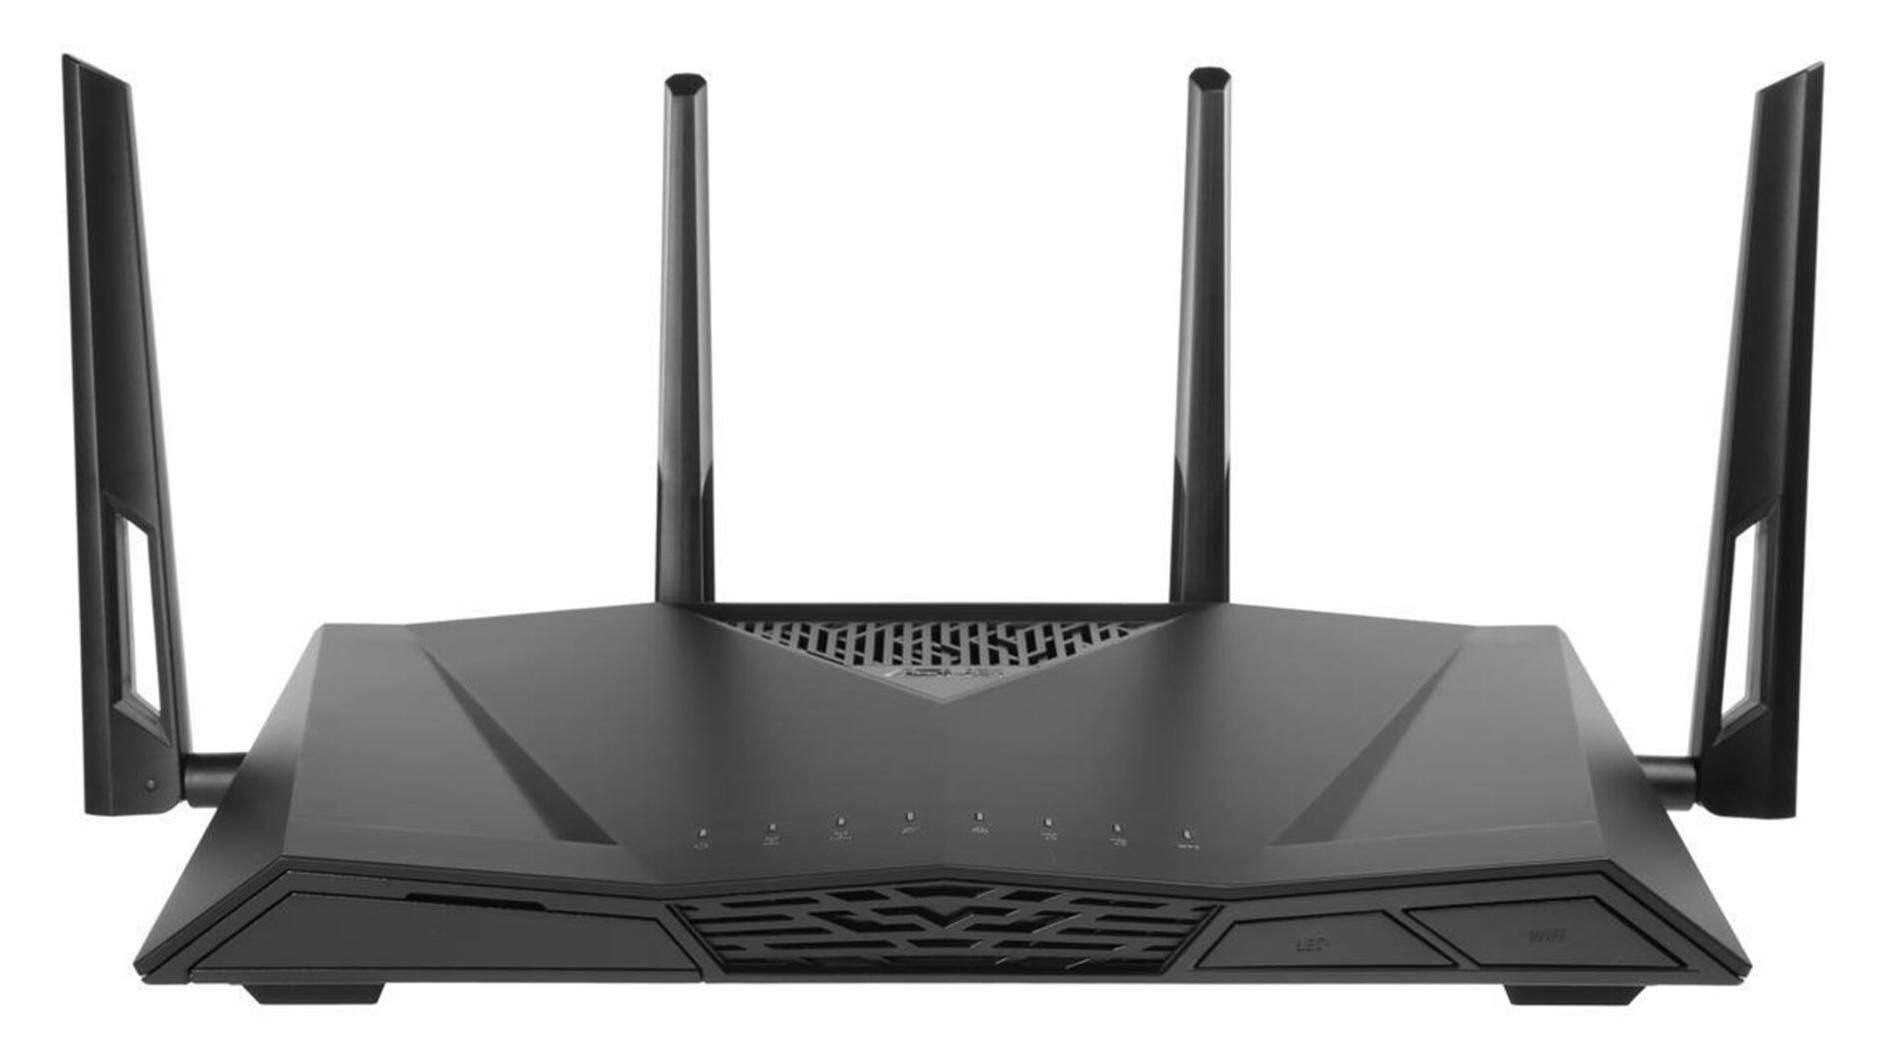 Asus Dual Band Gigabit WiFi Router